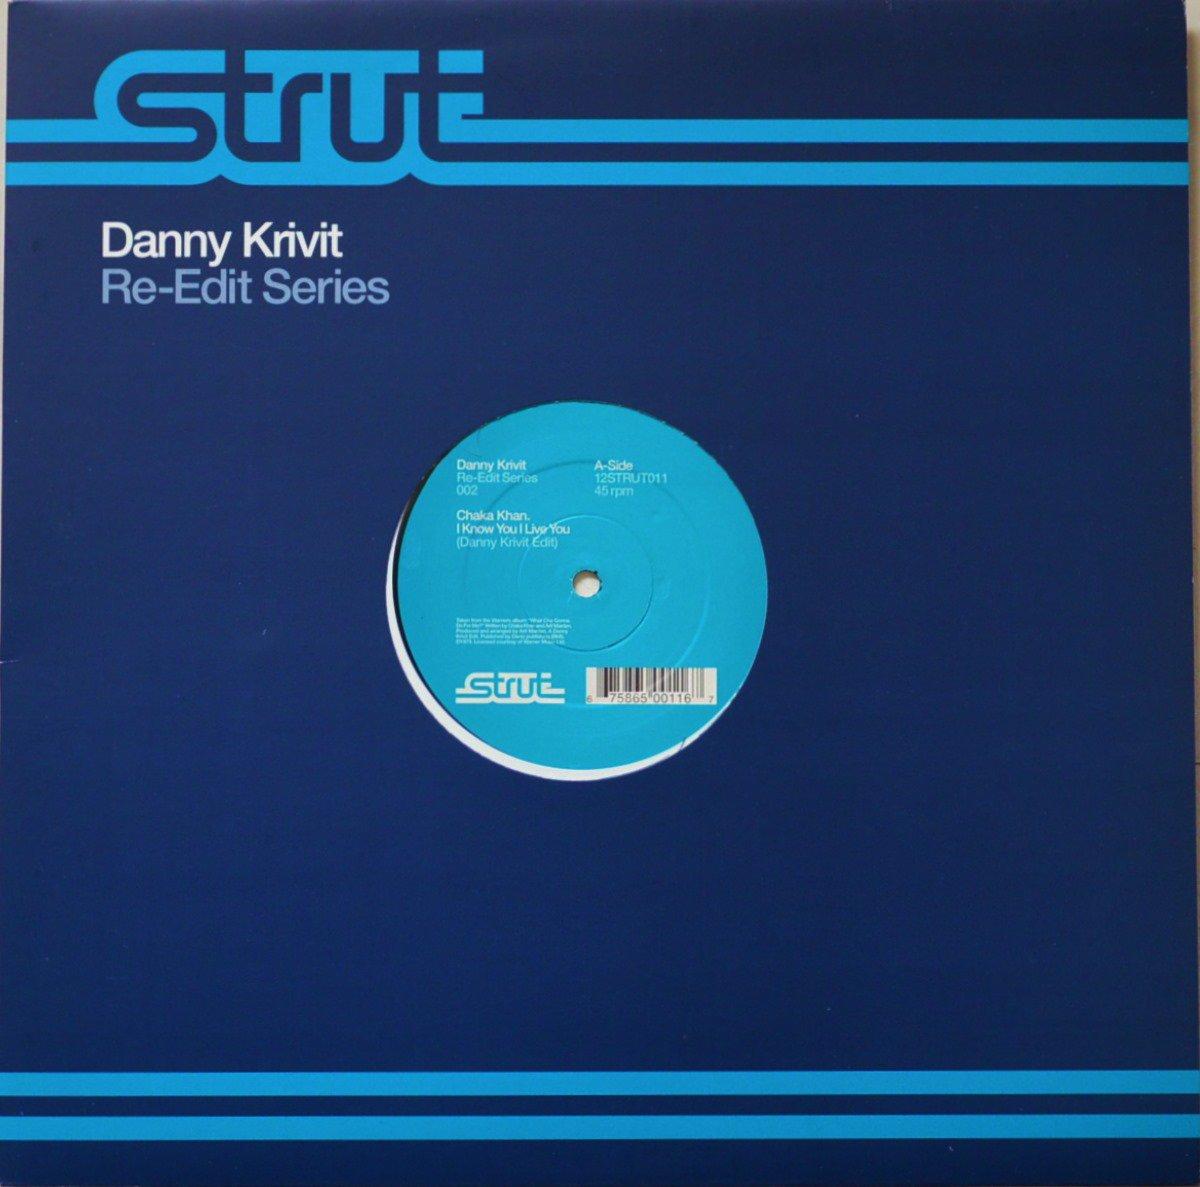 CHAKA KHAN / THE B-52'S / I KNOW YOU I LIVE YOU / MESOPOTAMIA (DANNY KRIVIT RE-EDIT SERIES) (